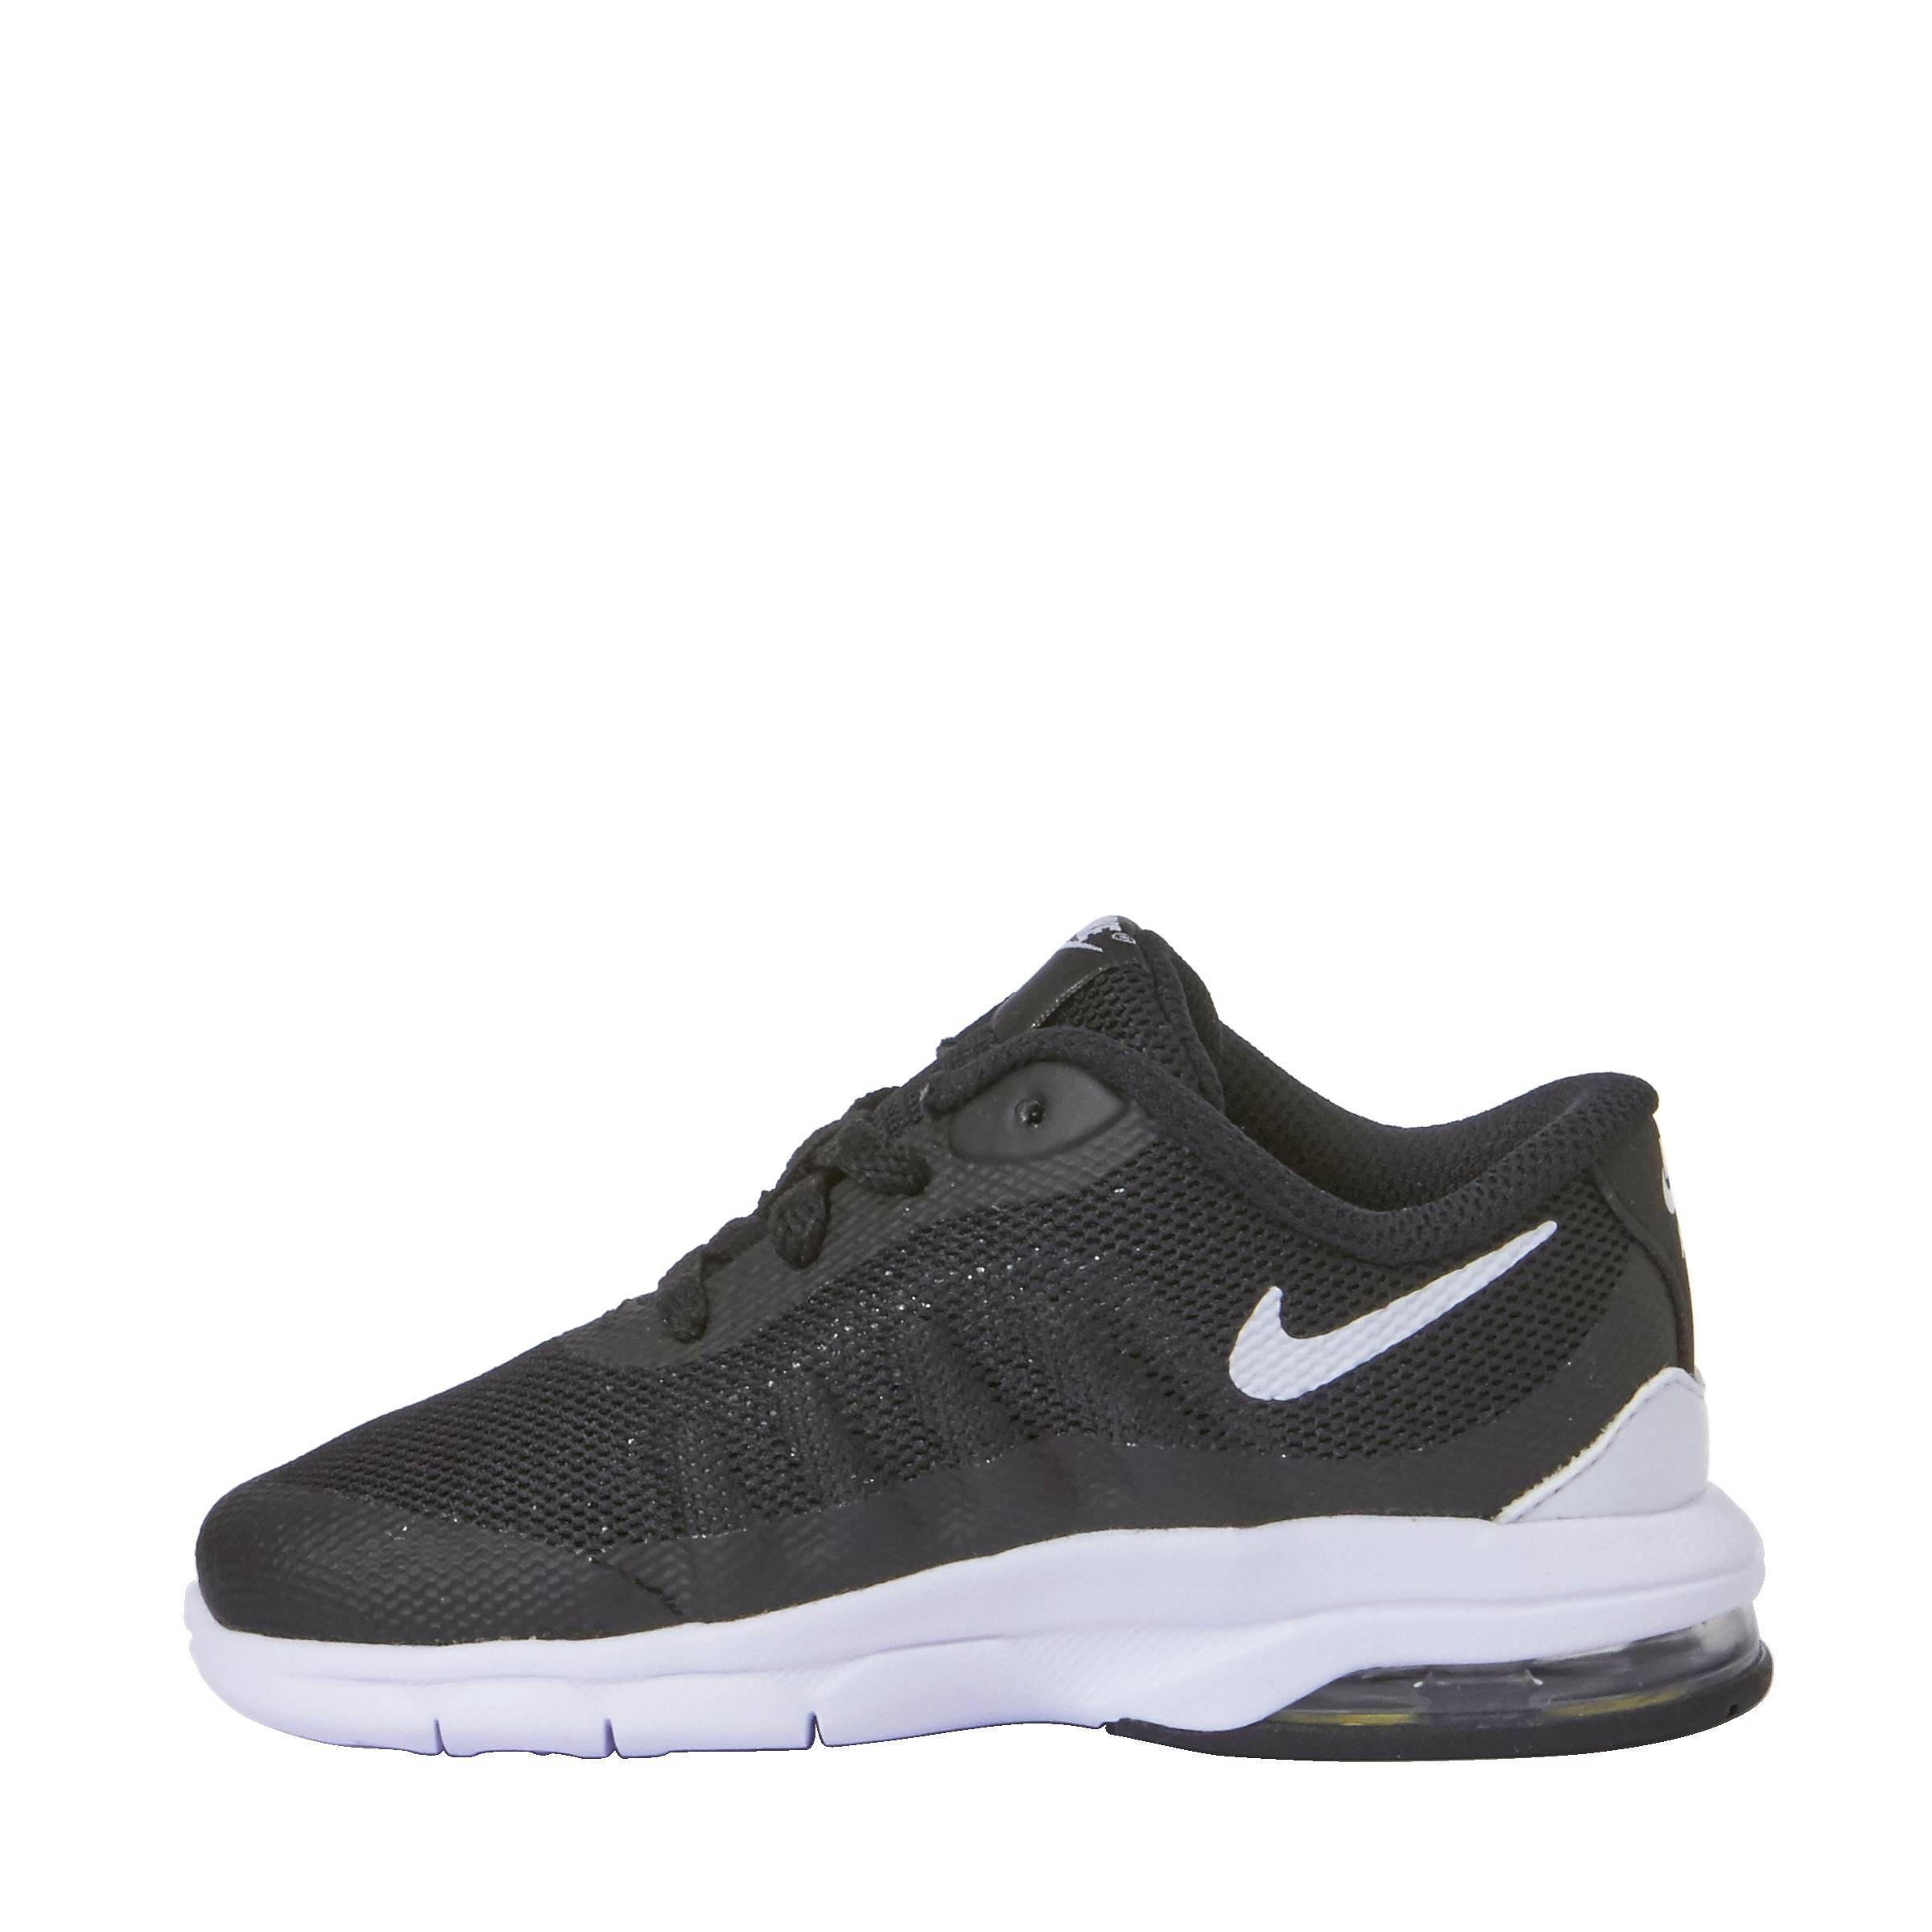 1d69bc45bef Nike Air Max Invigor sneakers | wehkamp